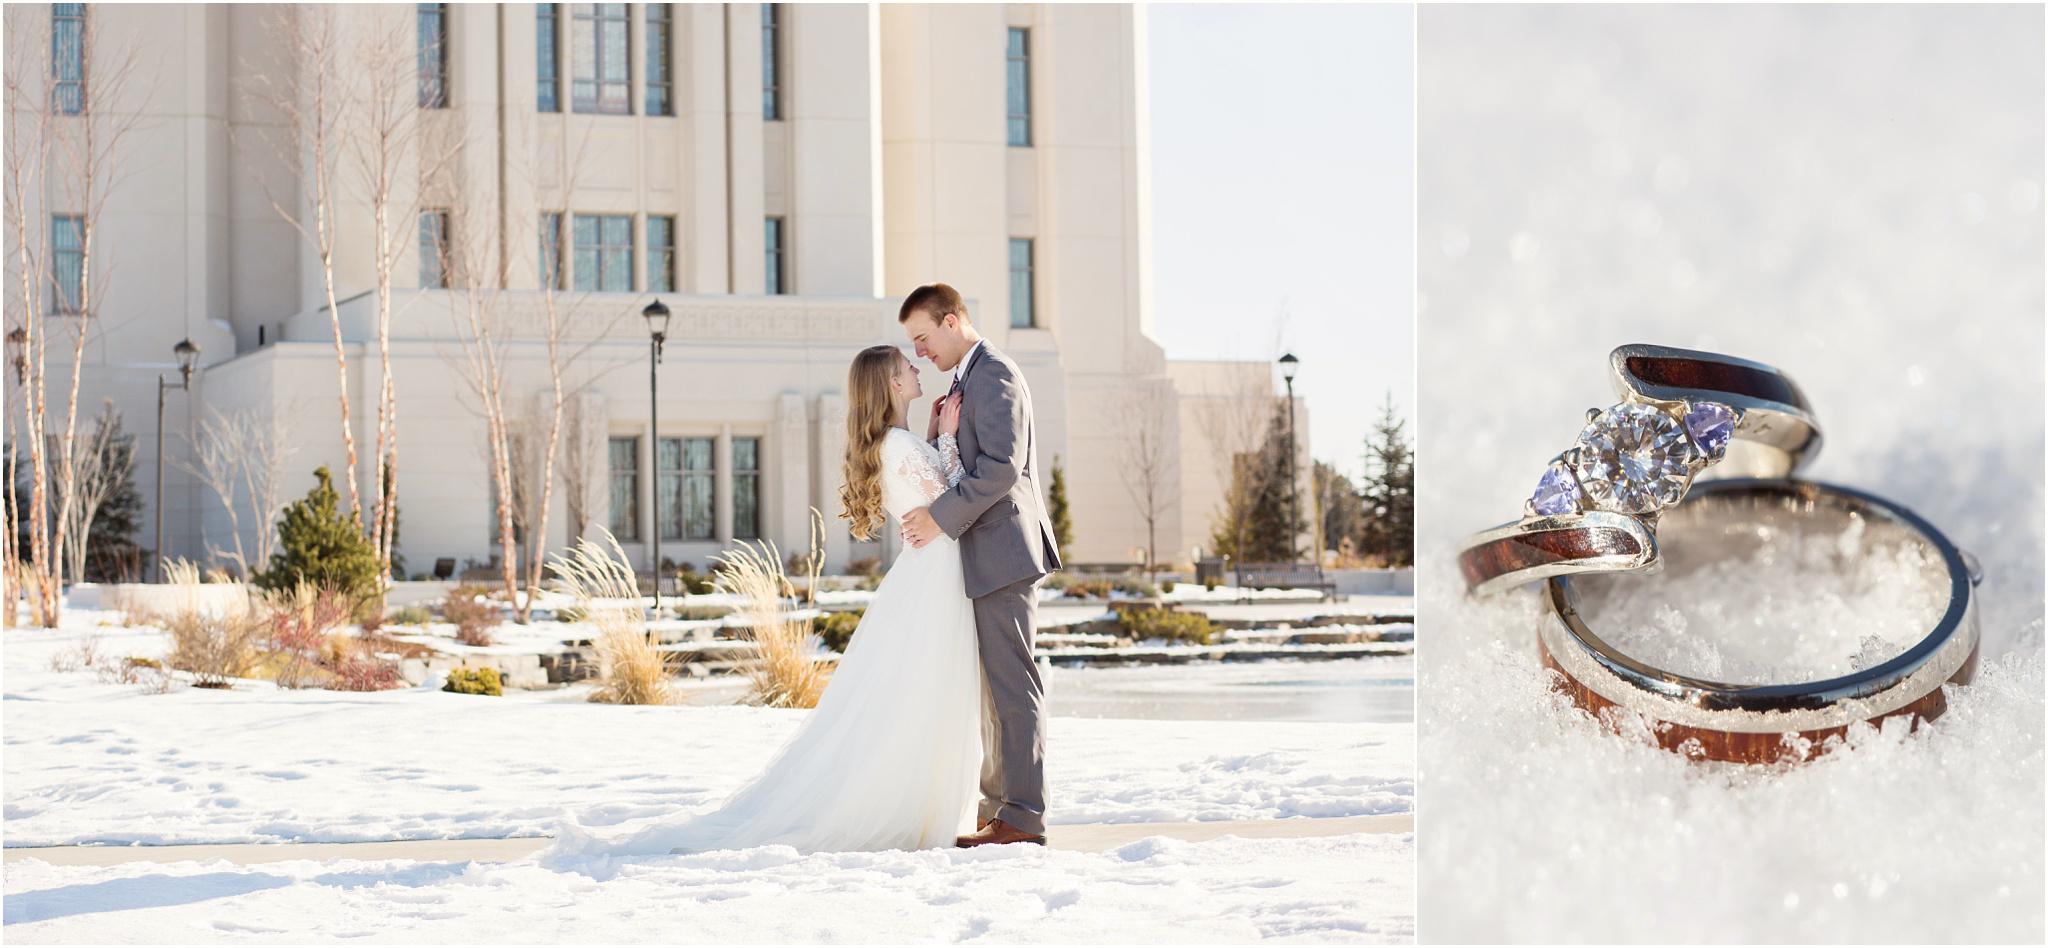 Wedding Photography_Meridian Idaho Temple_Boise Idaho_Leah Southwick Photography_0009.jpg